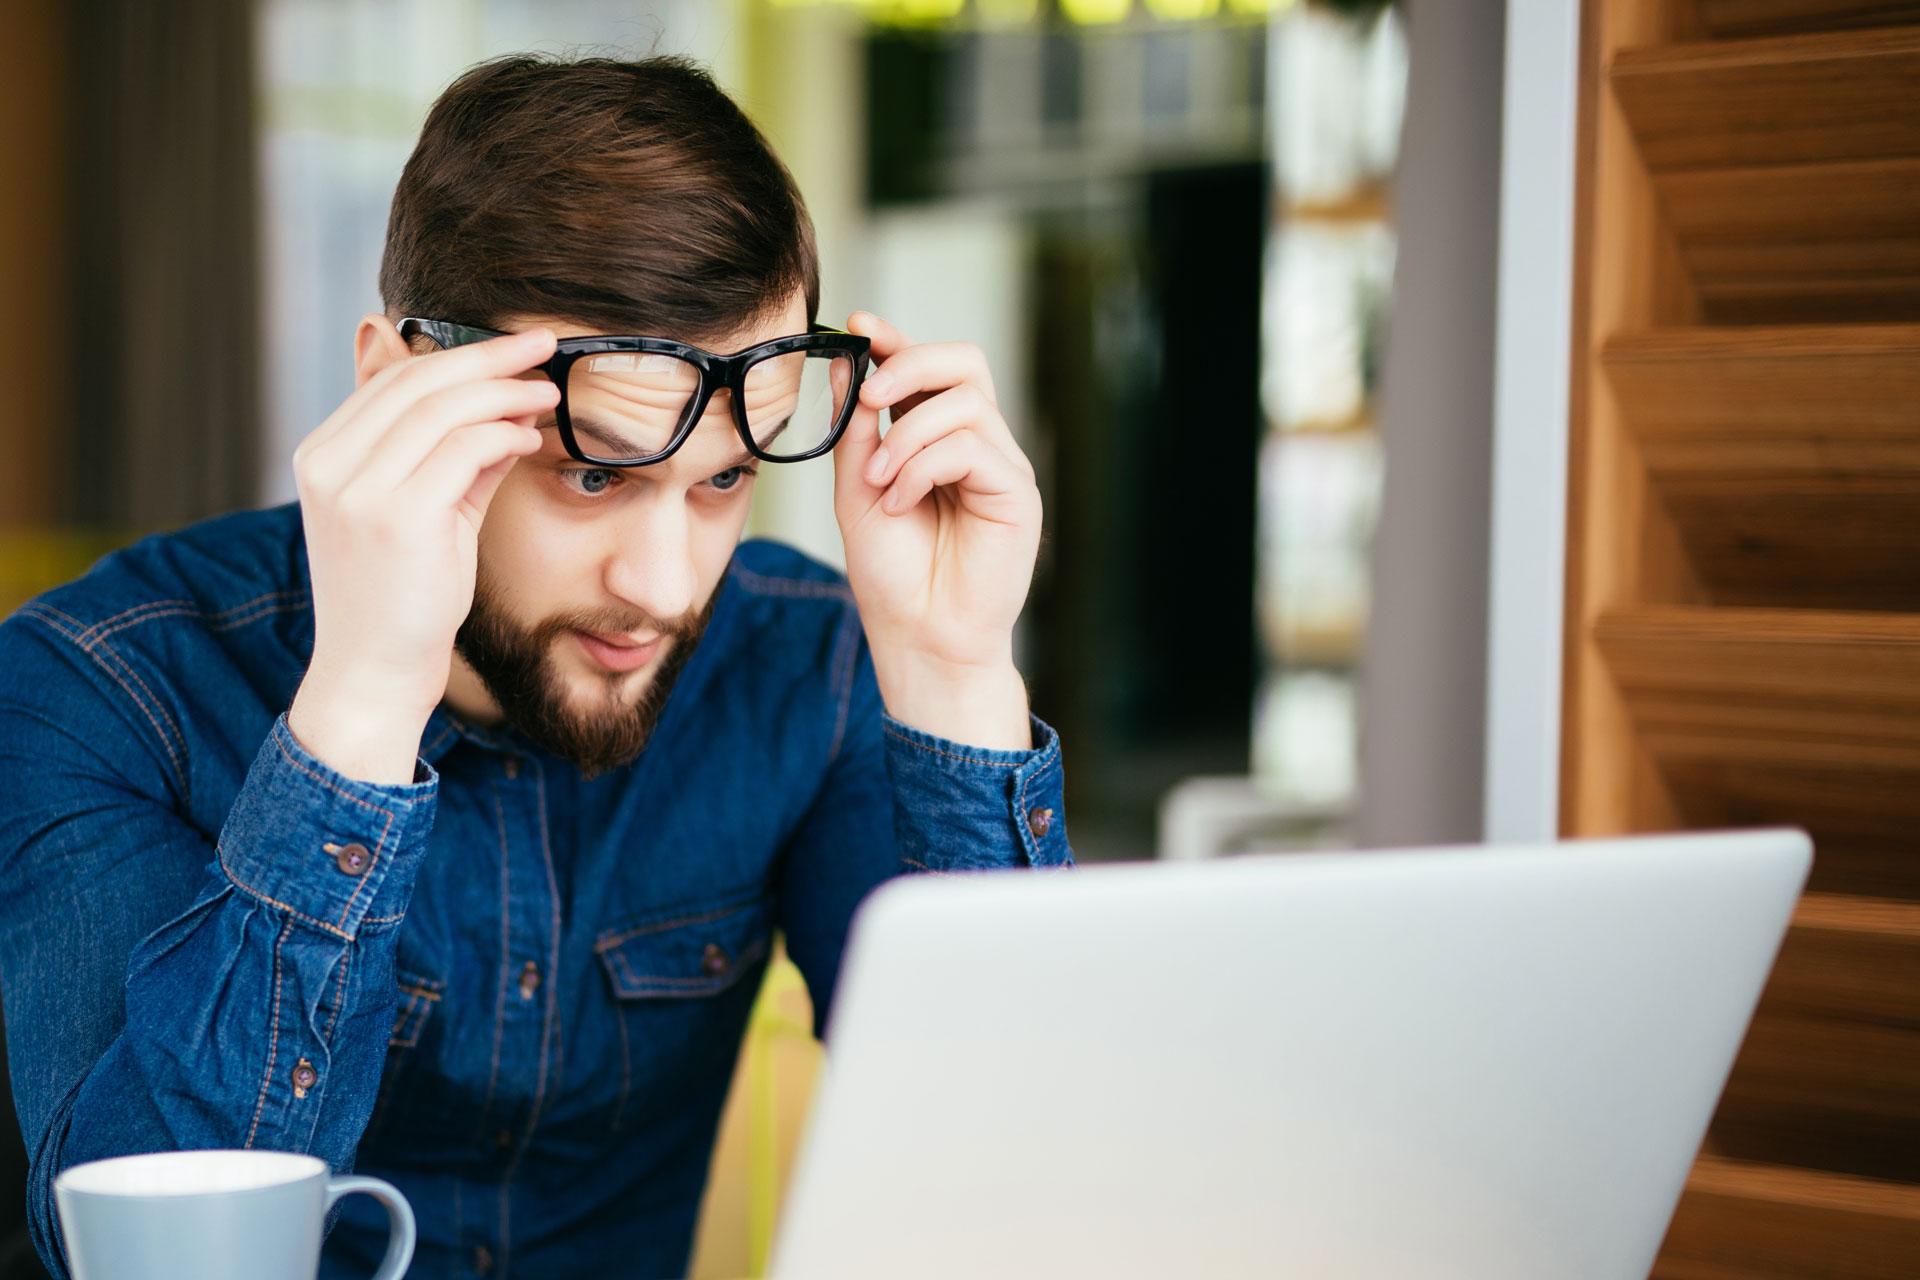 113119ccfadd Synsproblemer trods nye briller